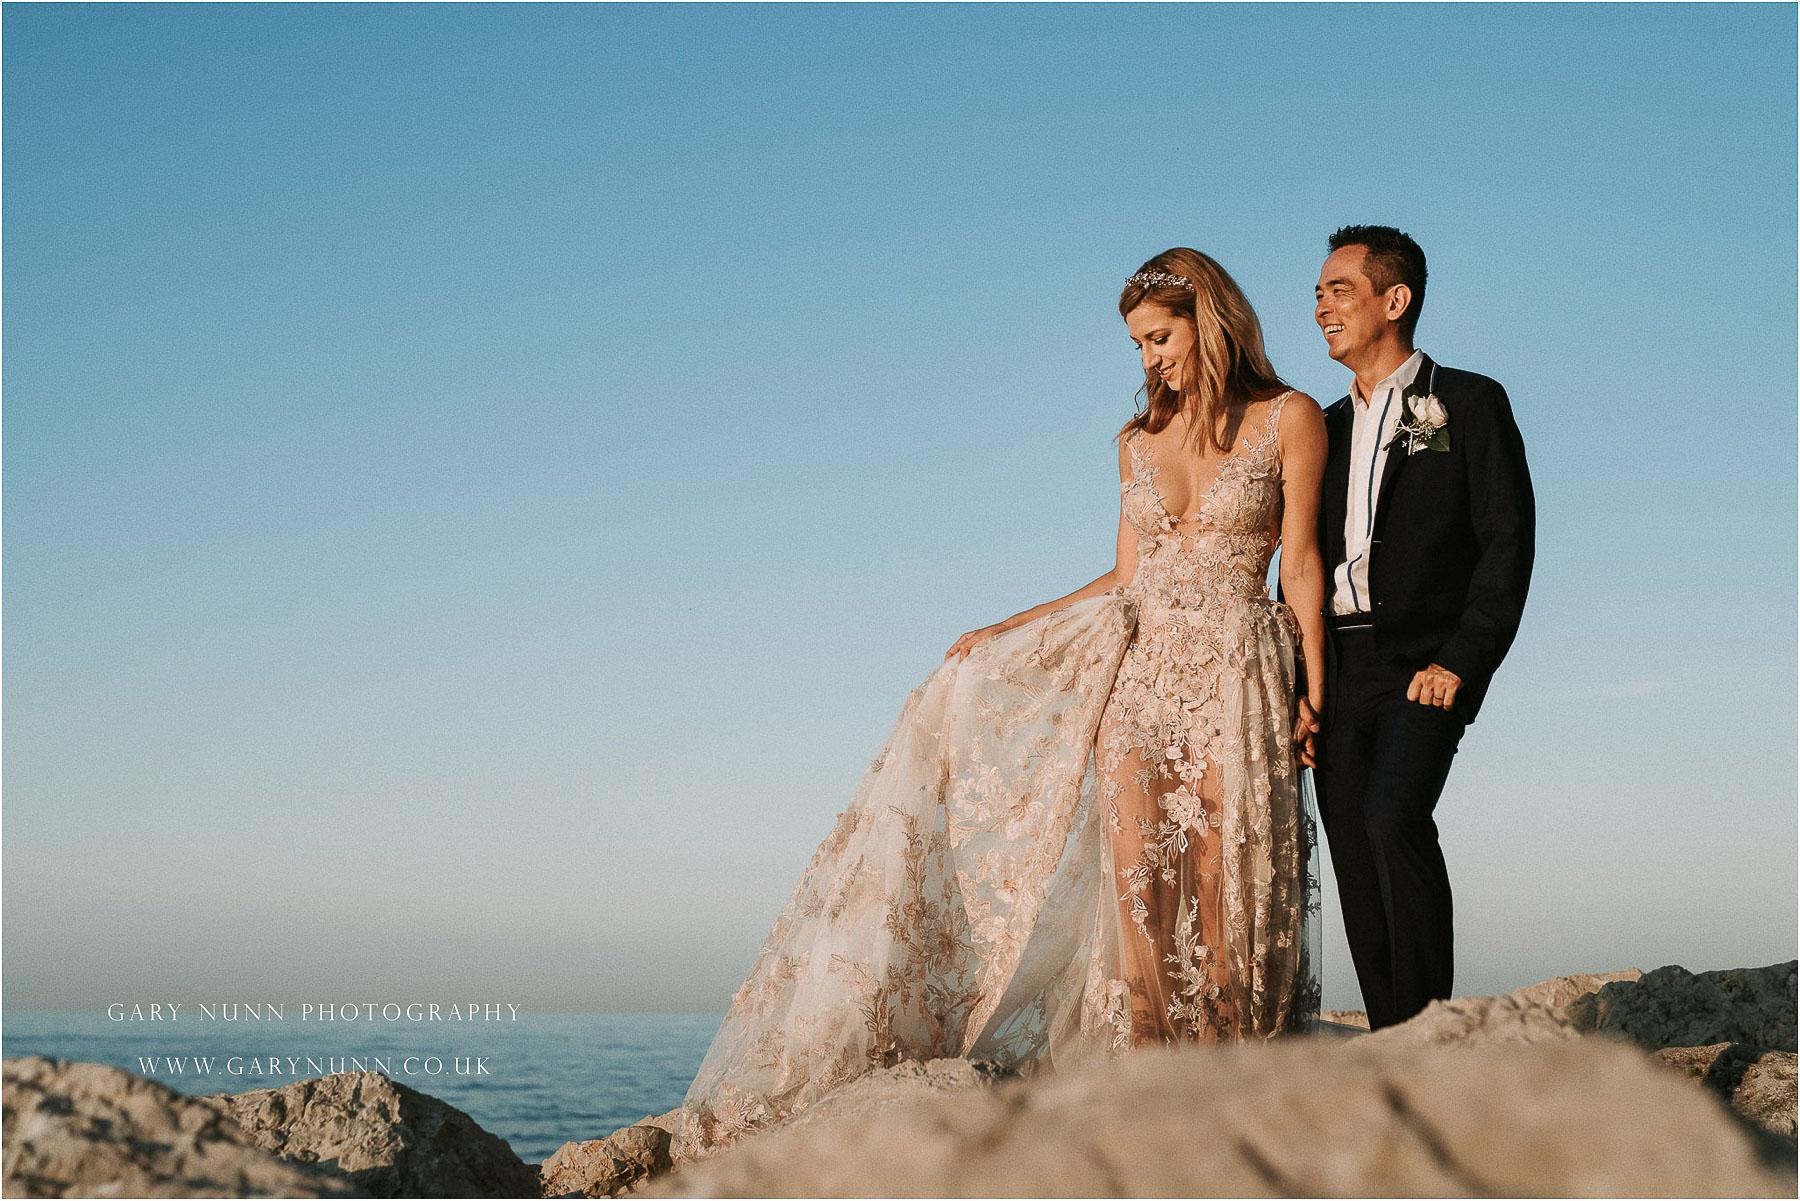 wedding photo checklist, first kiss, Torre Clementina, portonovo weddings, destination wedding photographer Italy, beautiful wedding dresses, Ancona, Portonovo,